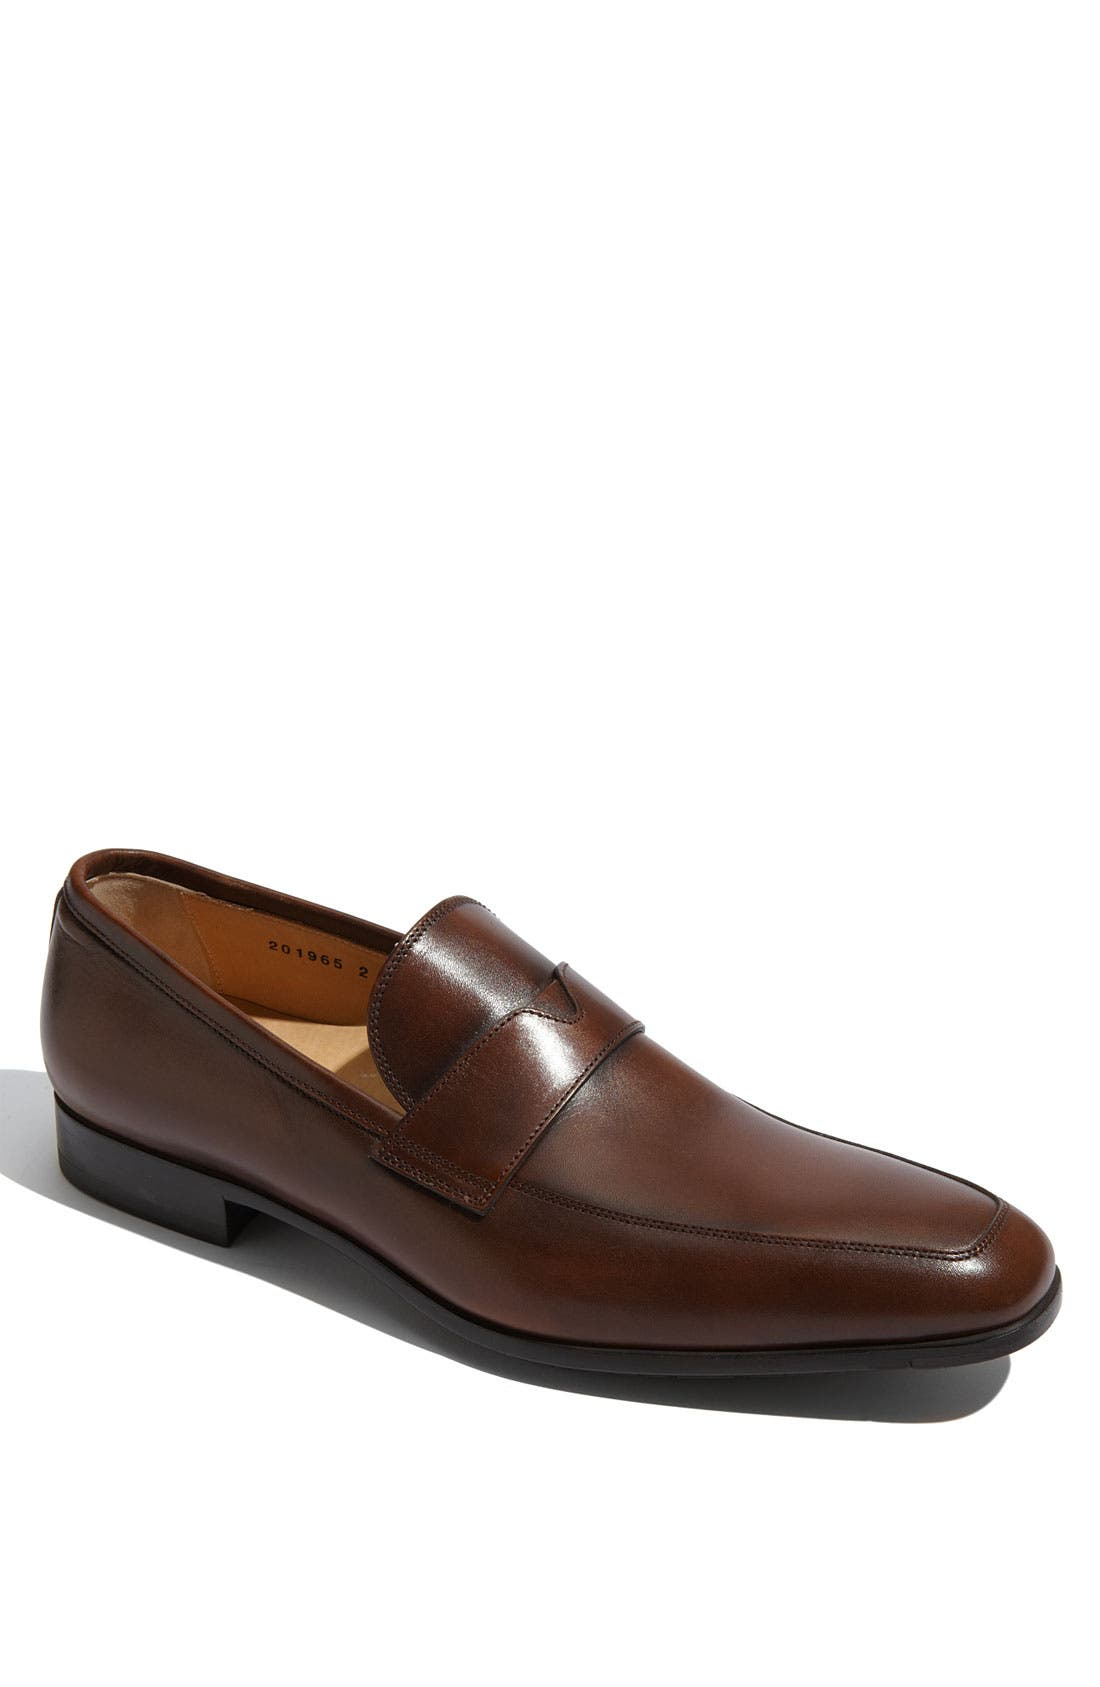 Alternate Image 1 Selected - Santoni 'Quinlan' Loafer